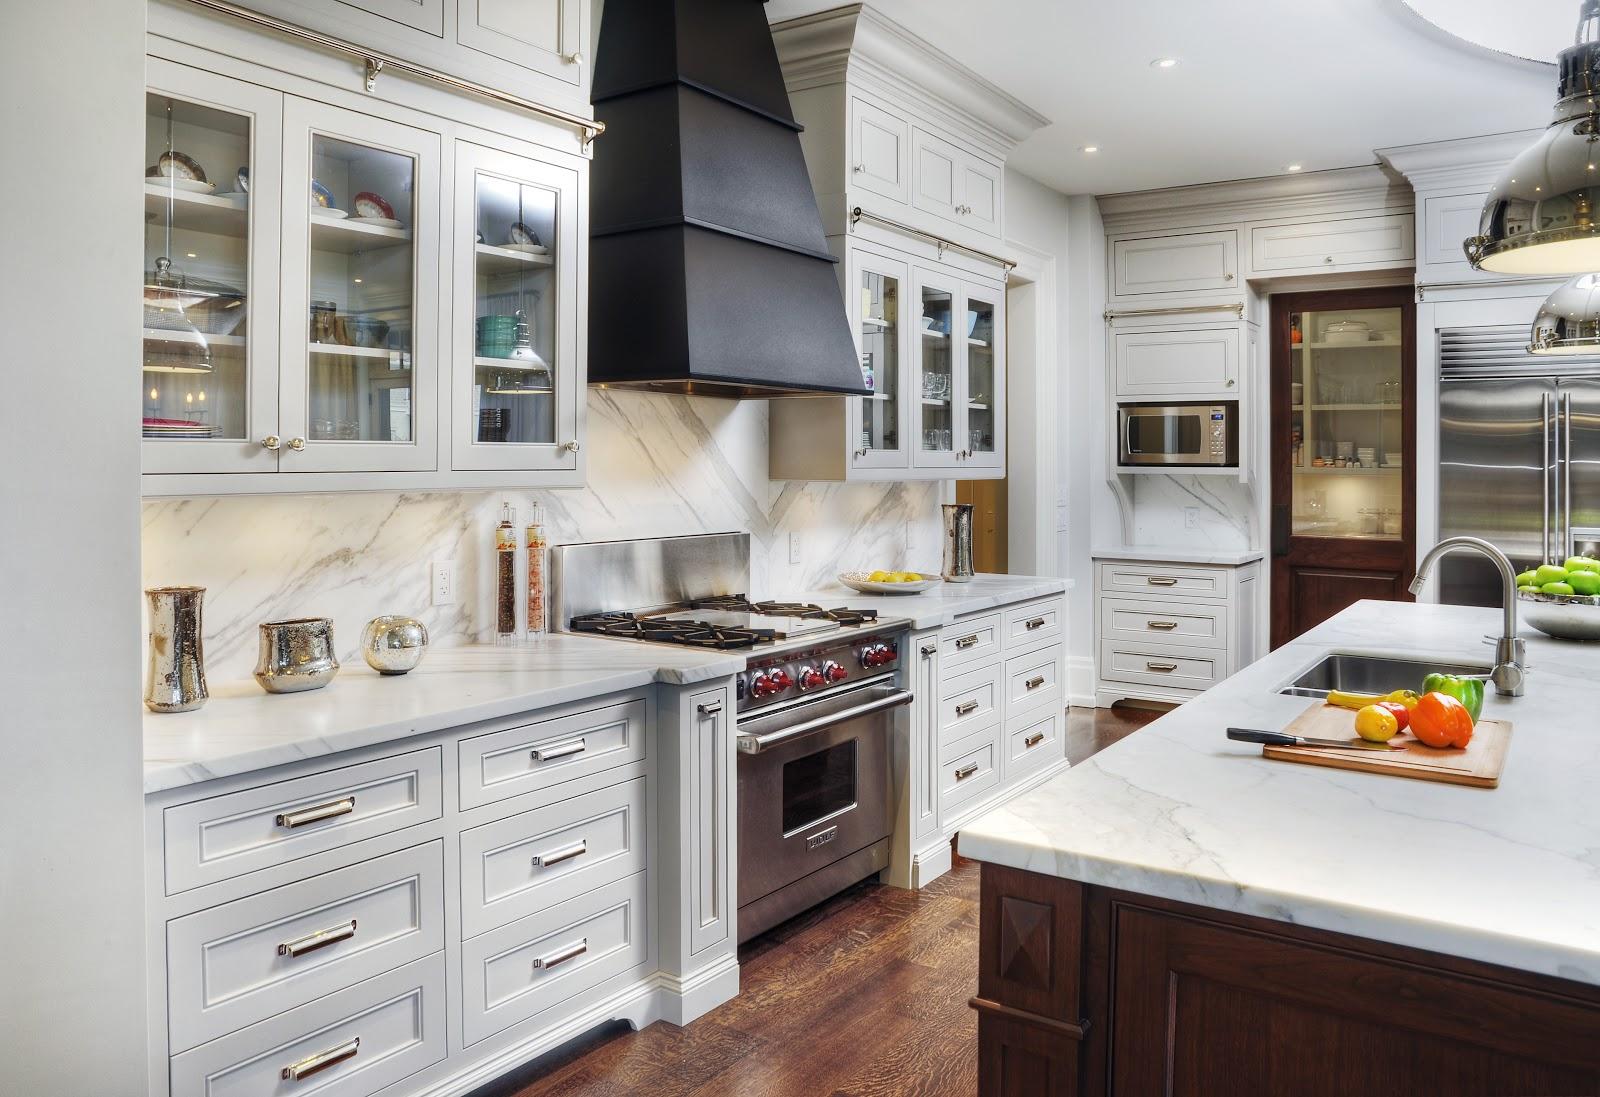 Kitchen Appliance Pics - KitcHen Design Ideas